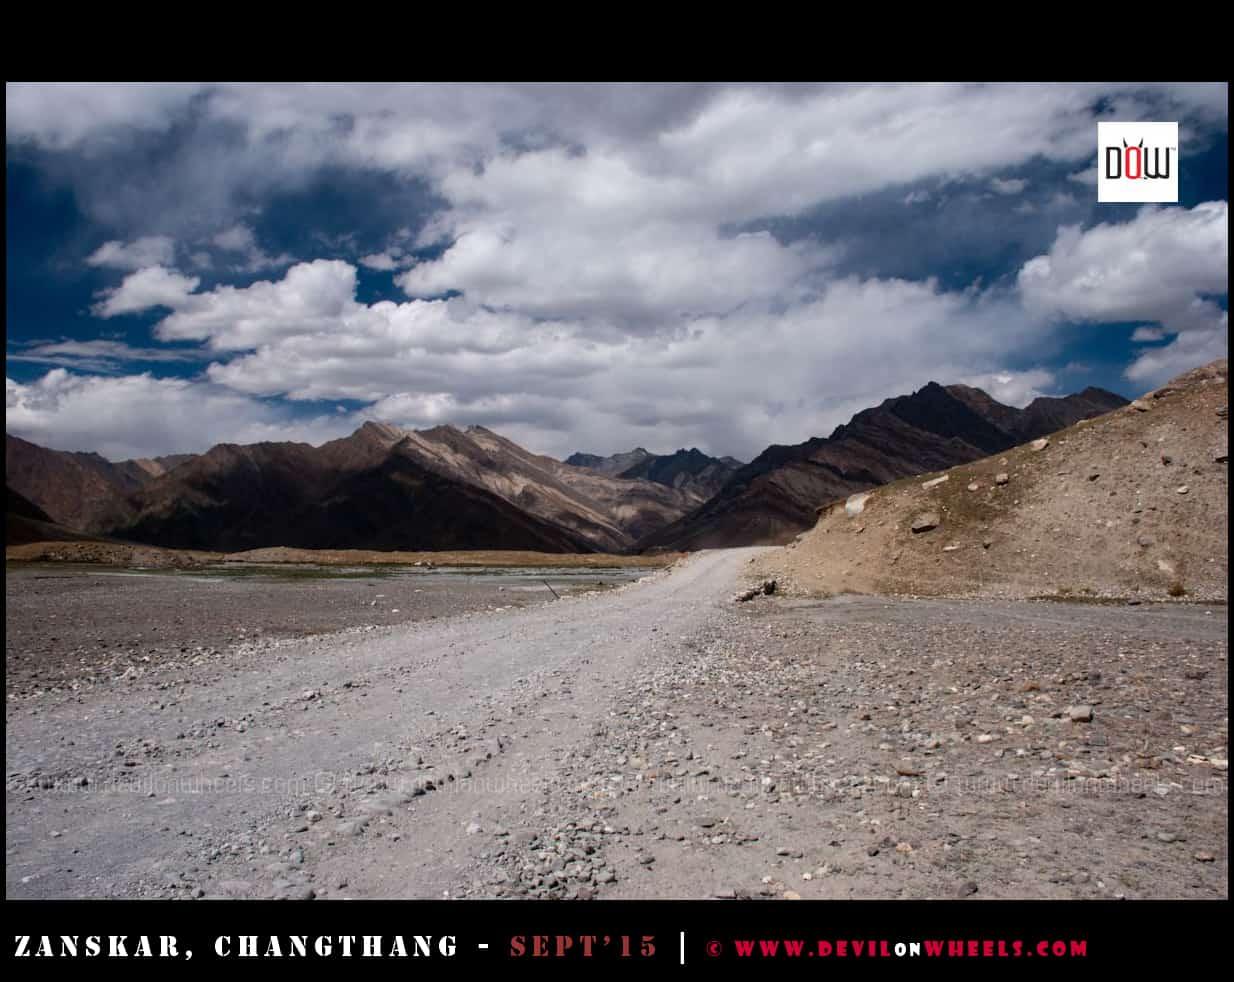 That raw nature in Zanskar Valley